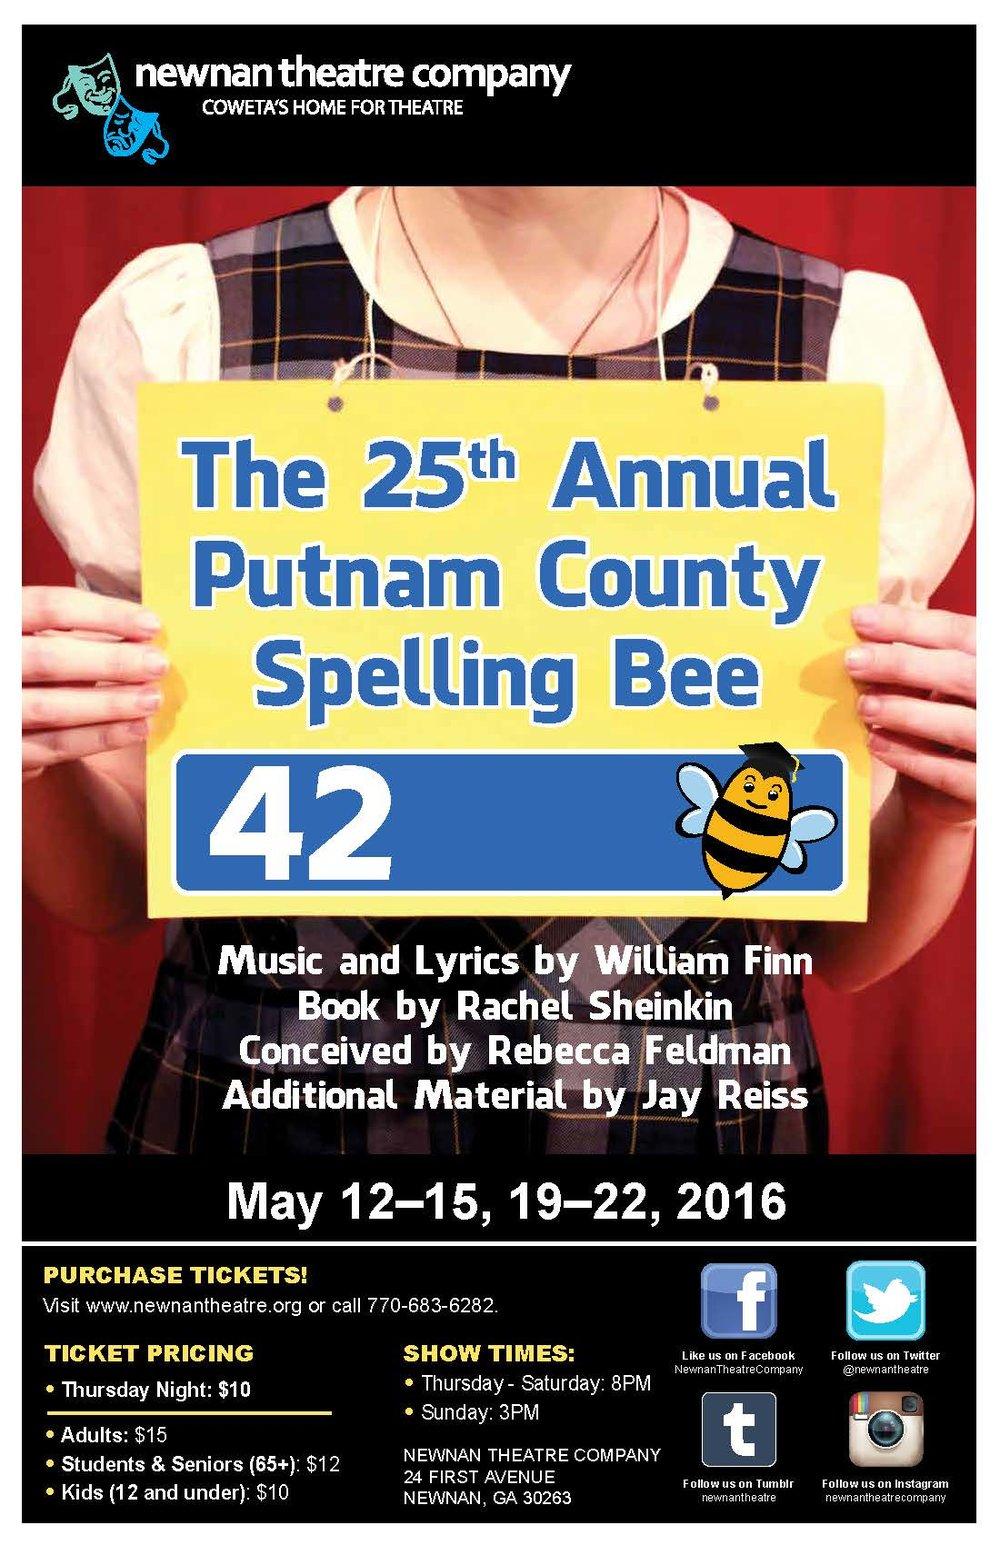 Putnam_11x17 poster.jpg